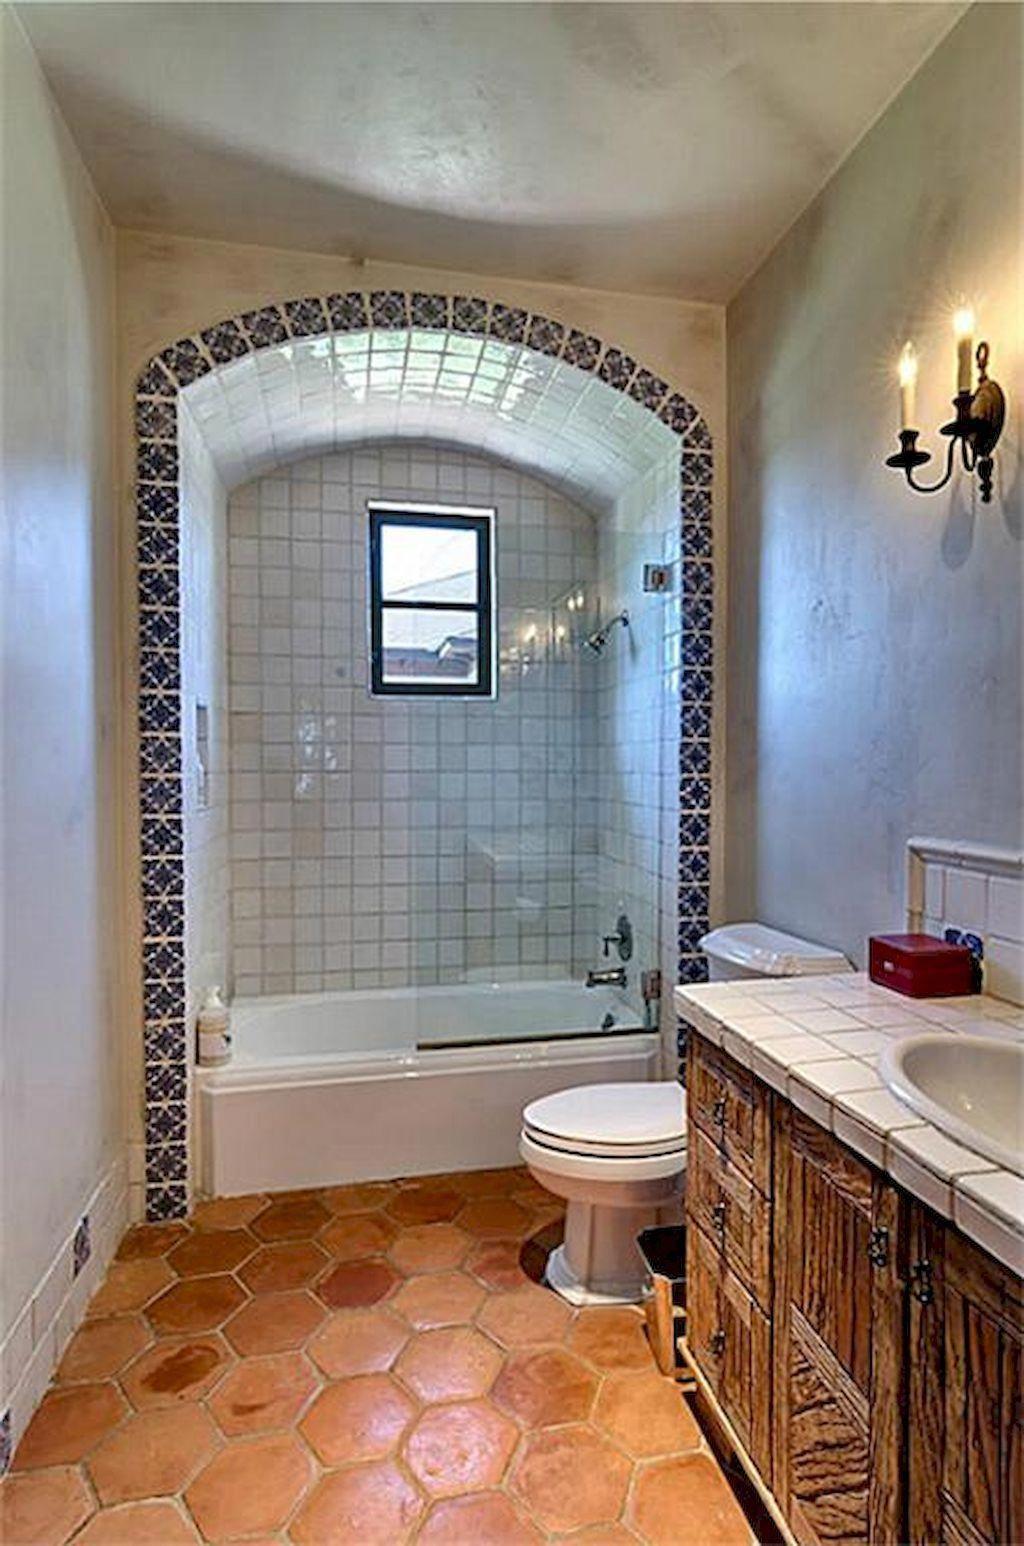 #Spanishstyle in 2020 | Spanish bathroom, Mexican tile ...